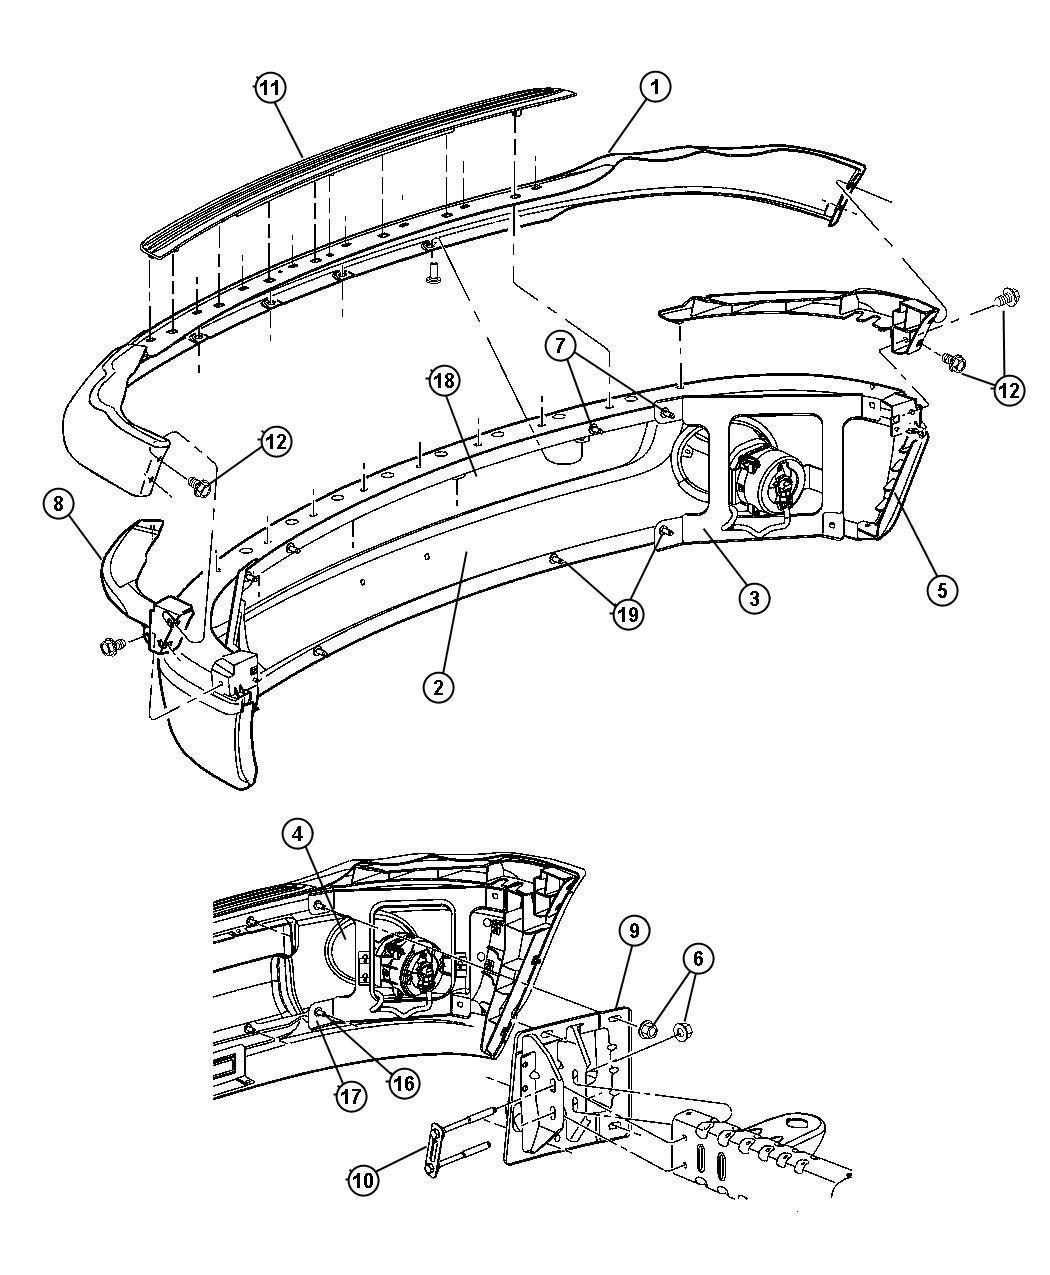 04 dodge ram wiring diagram rear